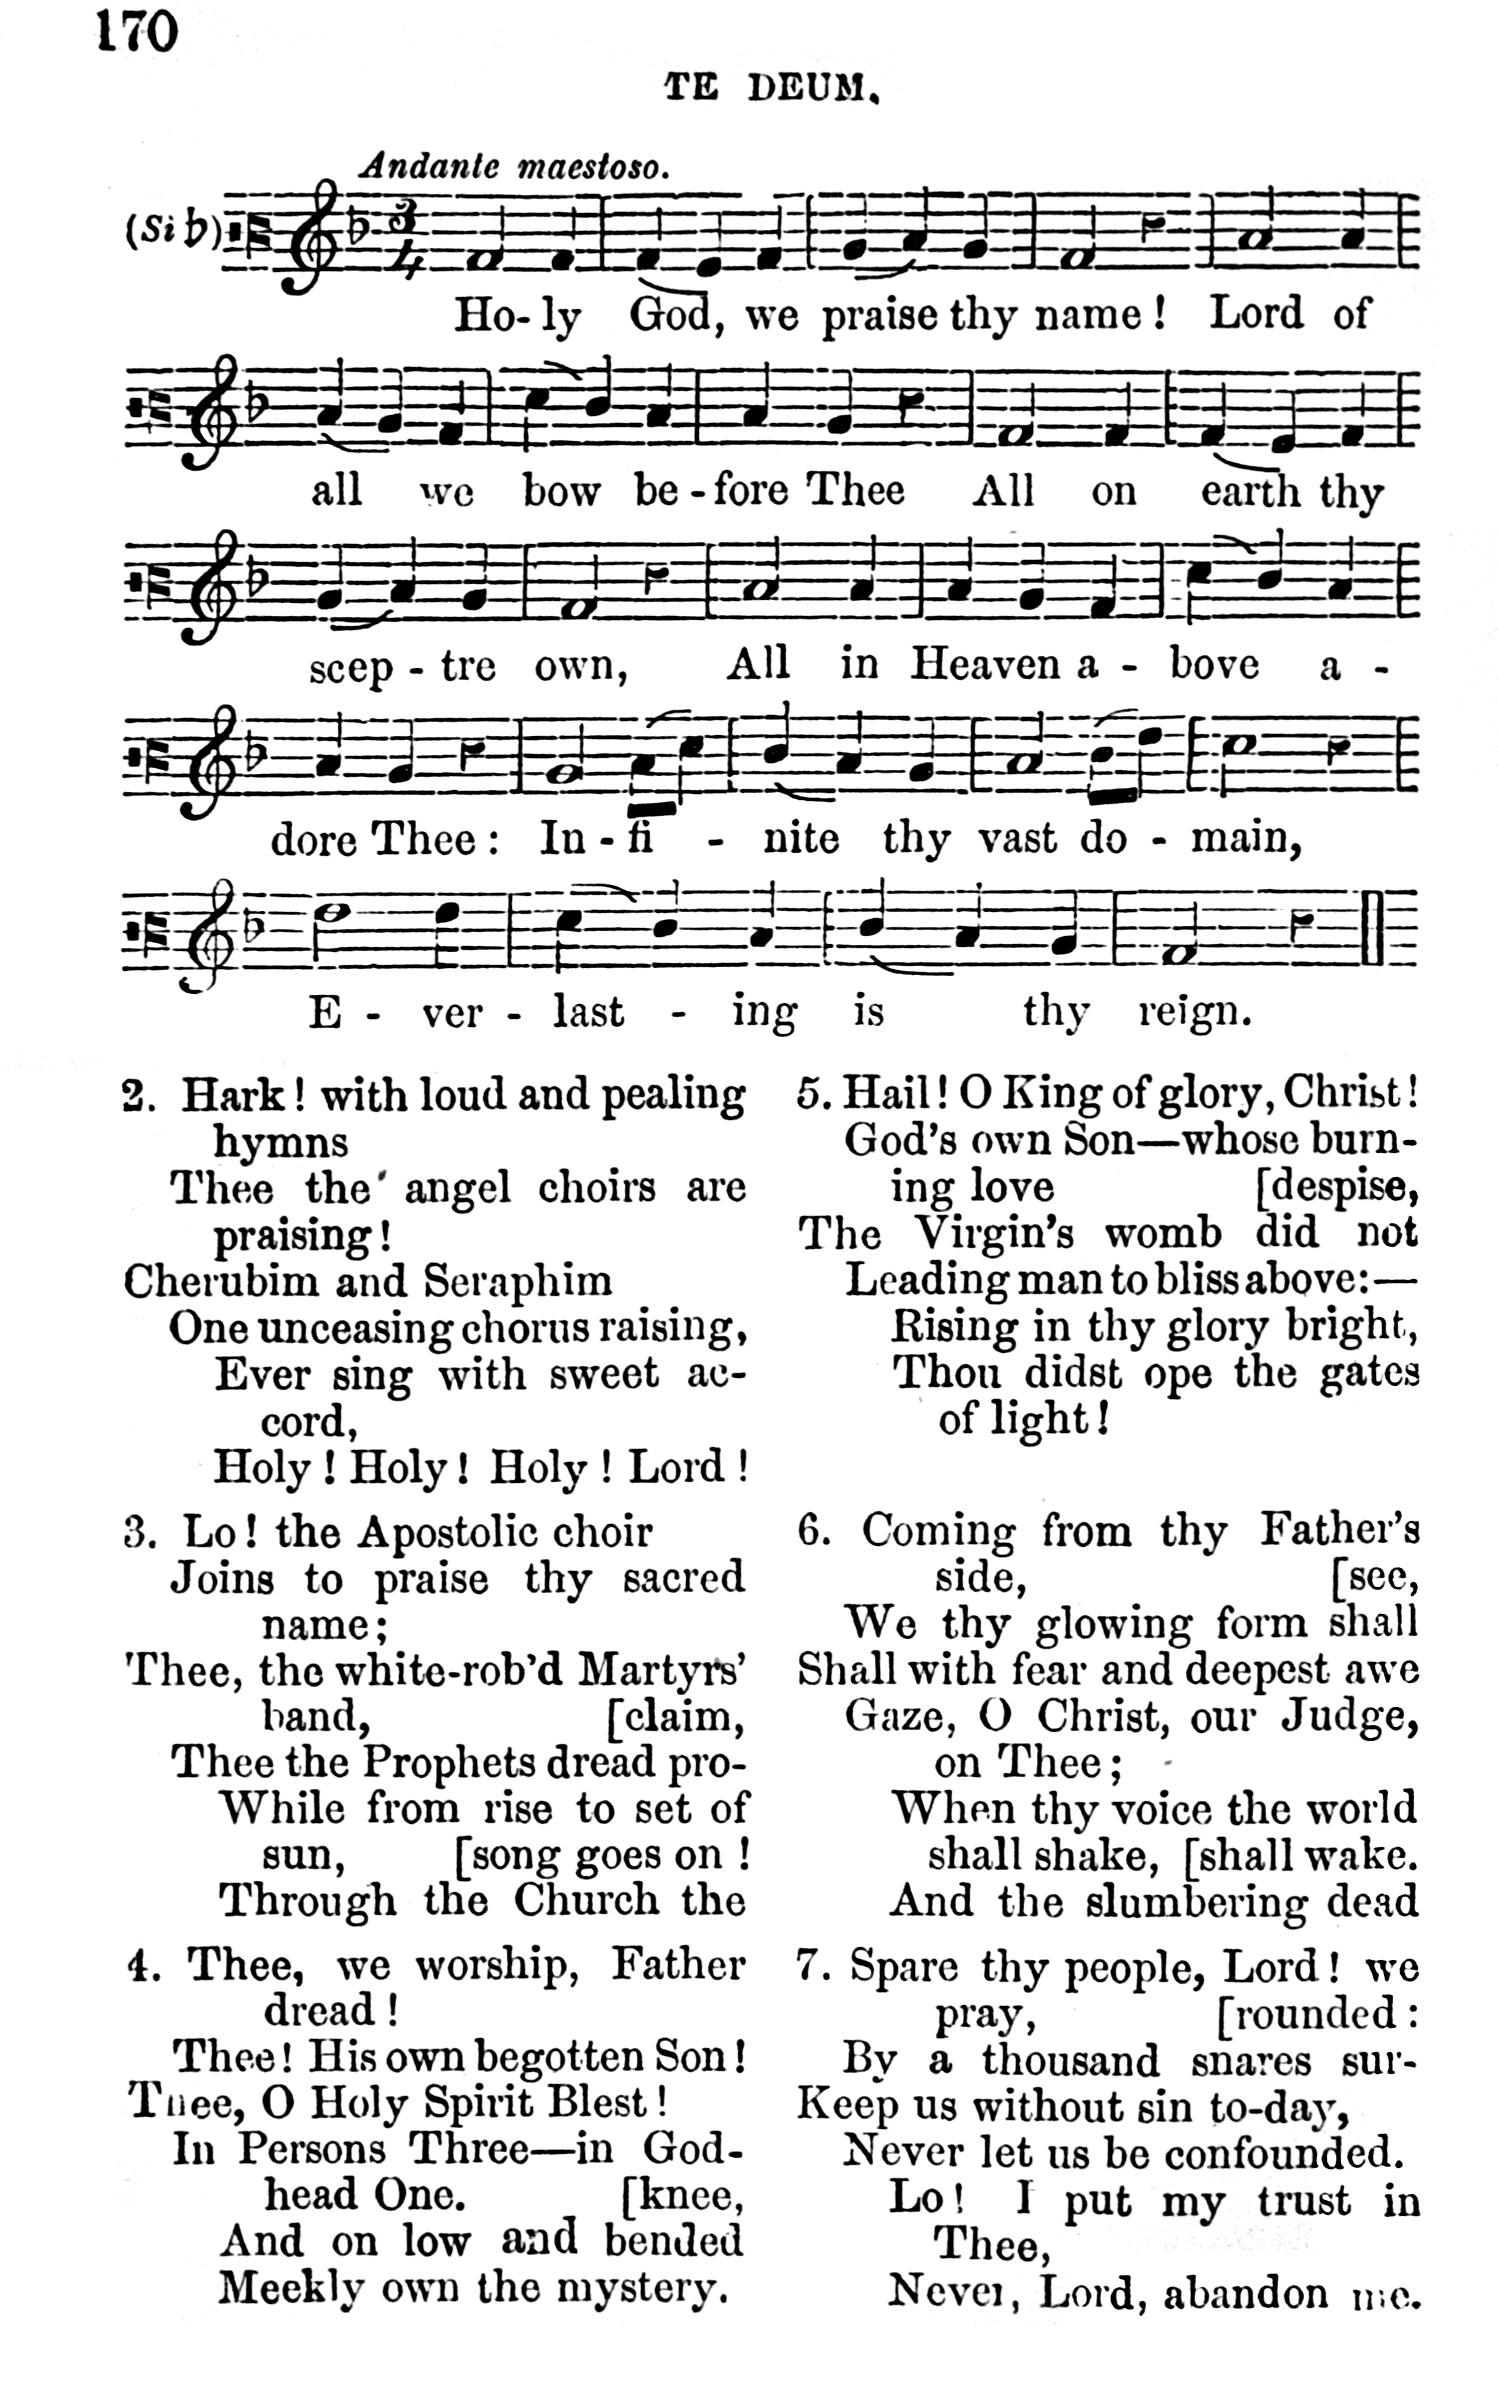 Fig. 14.  C.B. Lyons,  The Catholic Psalmist  (Dublin: James Duffy, 1858).